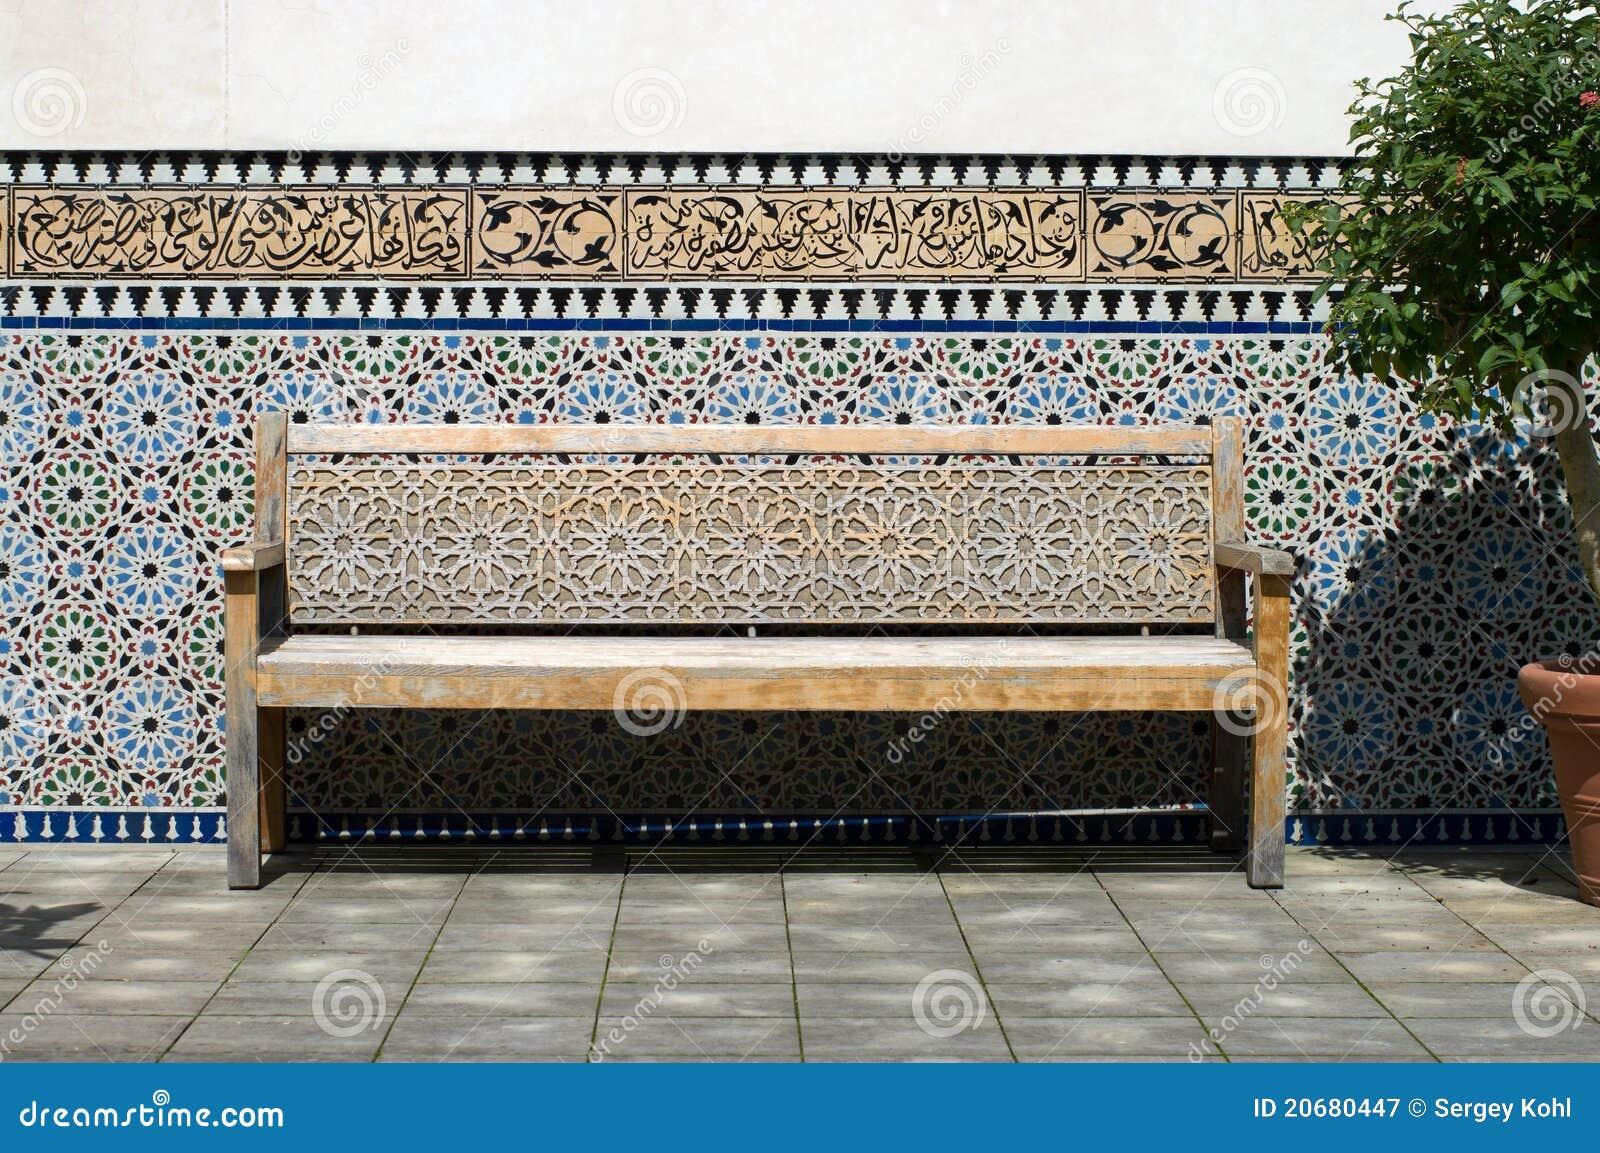 banc dans la cour marocaine image stock image 20680447. Black Bedroom Furniture Sets. Home Design Ideas